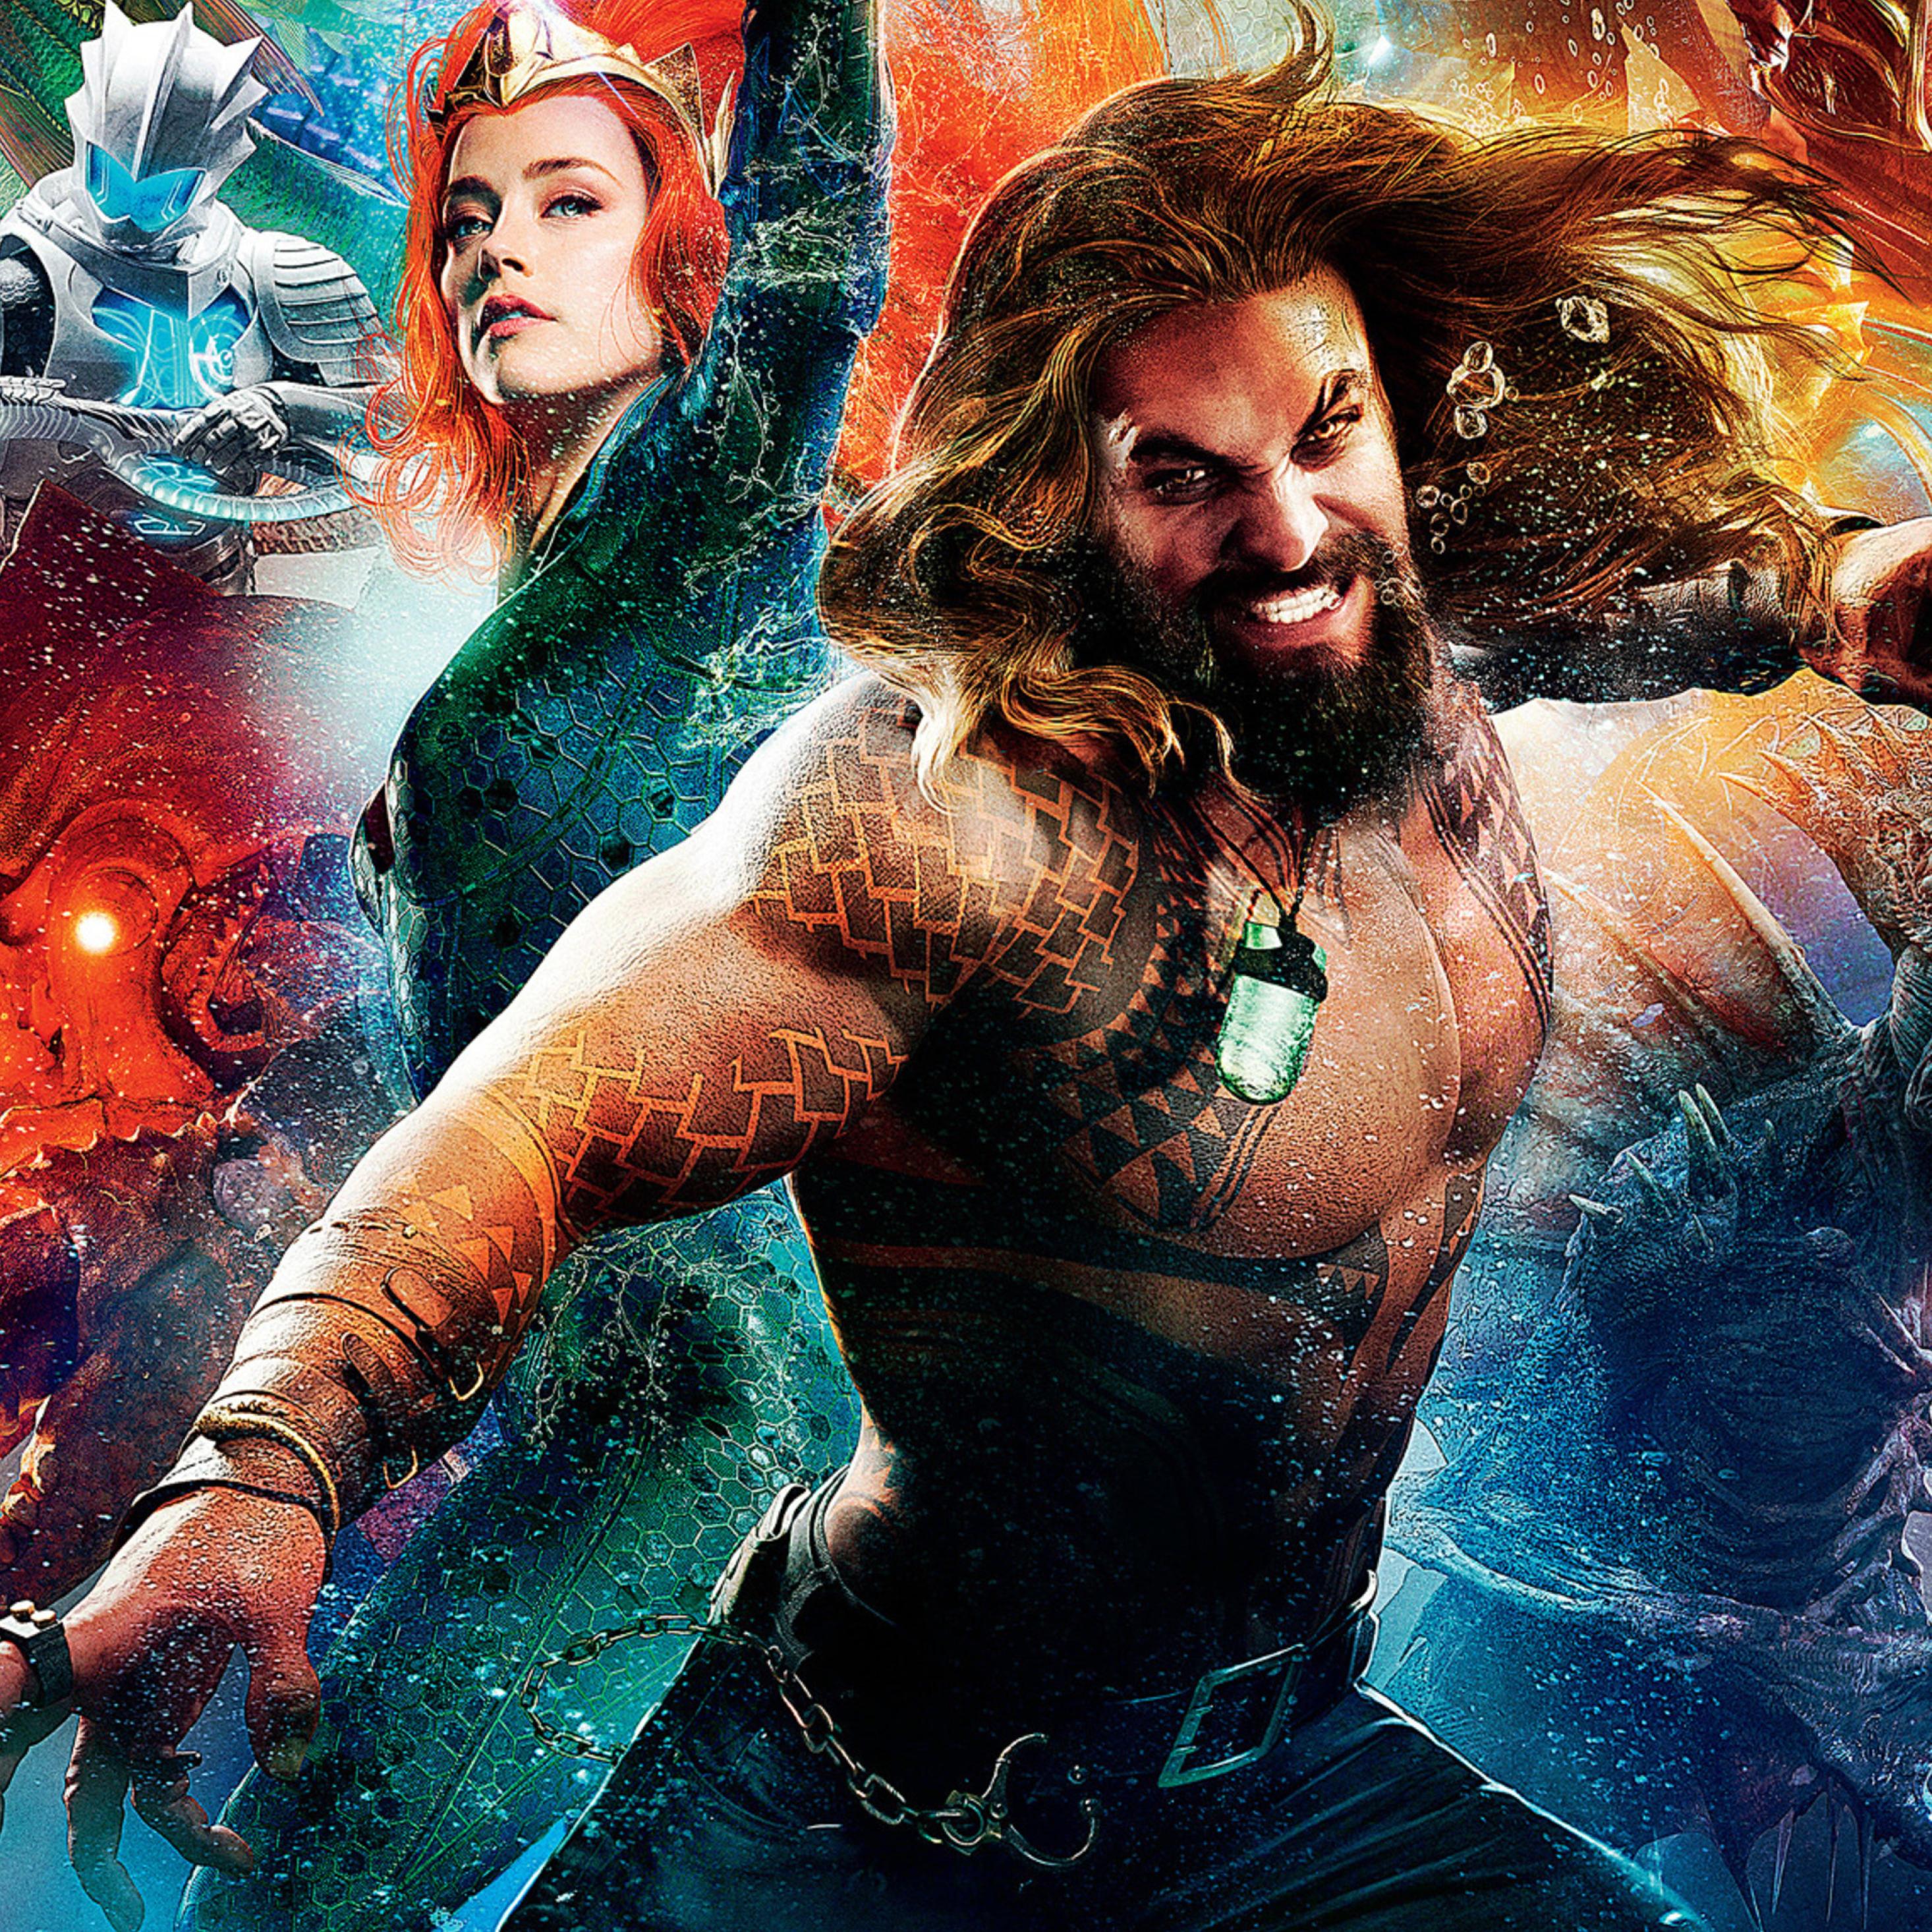 Aquaman Jason Momoa Mera Aquaman S Wifey Amber Heard: Amber Heard As Mera And Jason Momoa As Aquaman, HD 4K